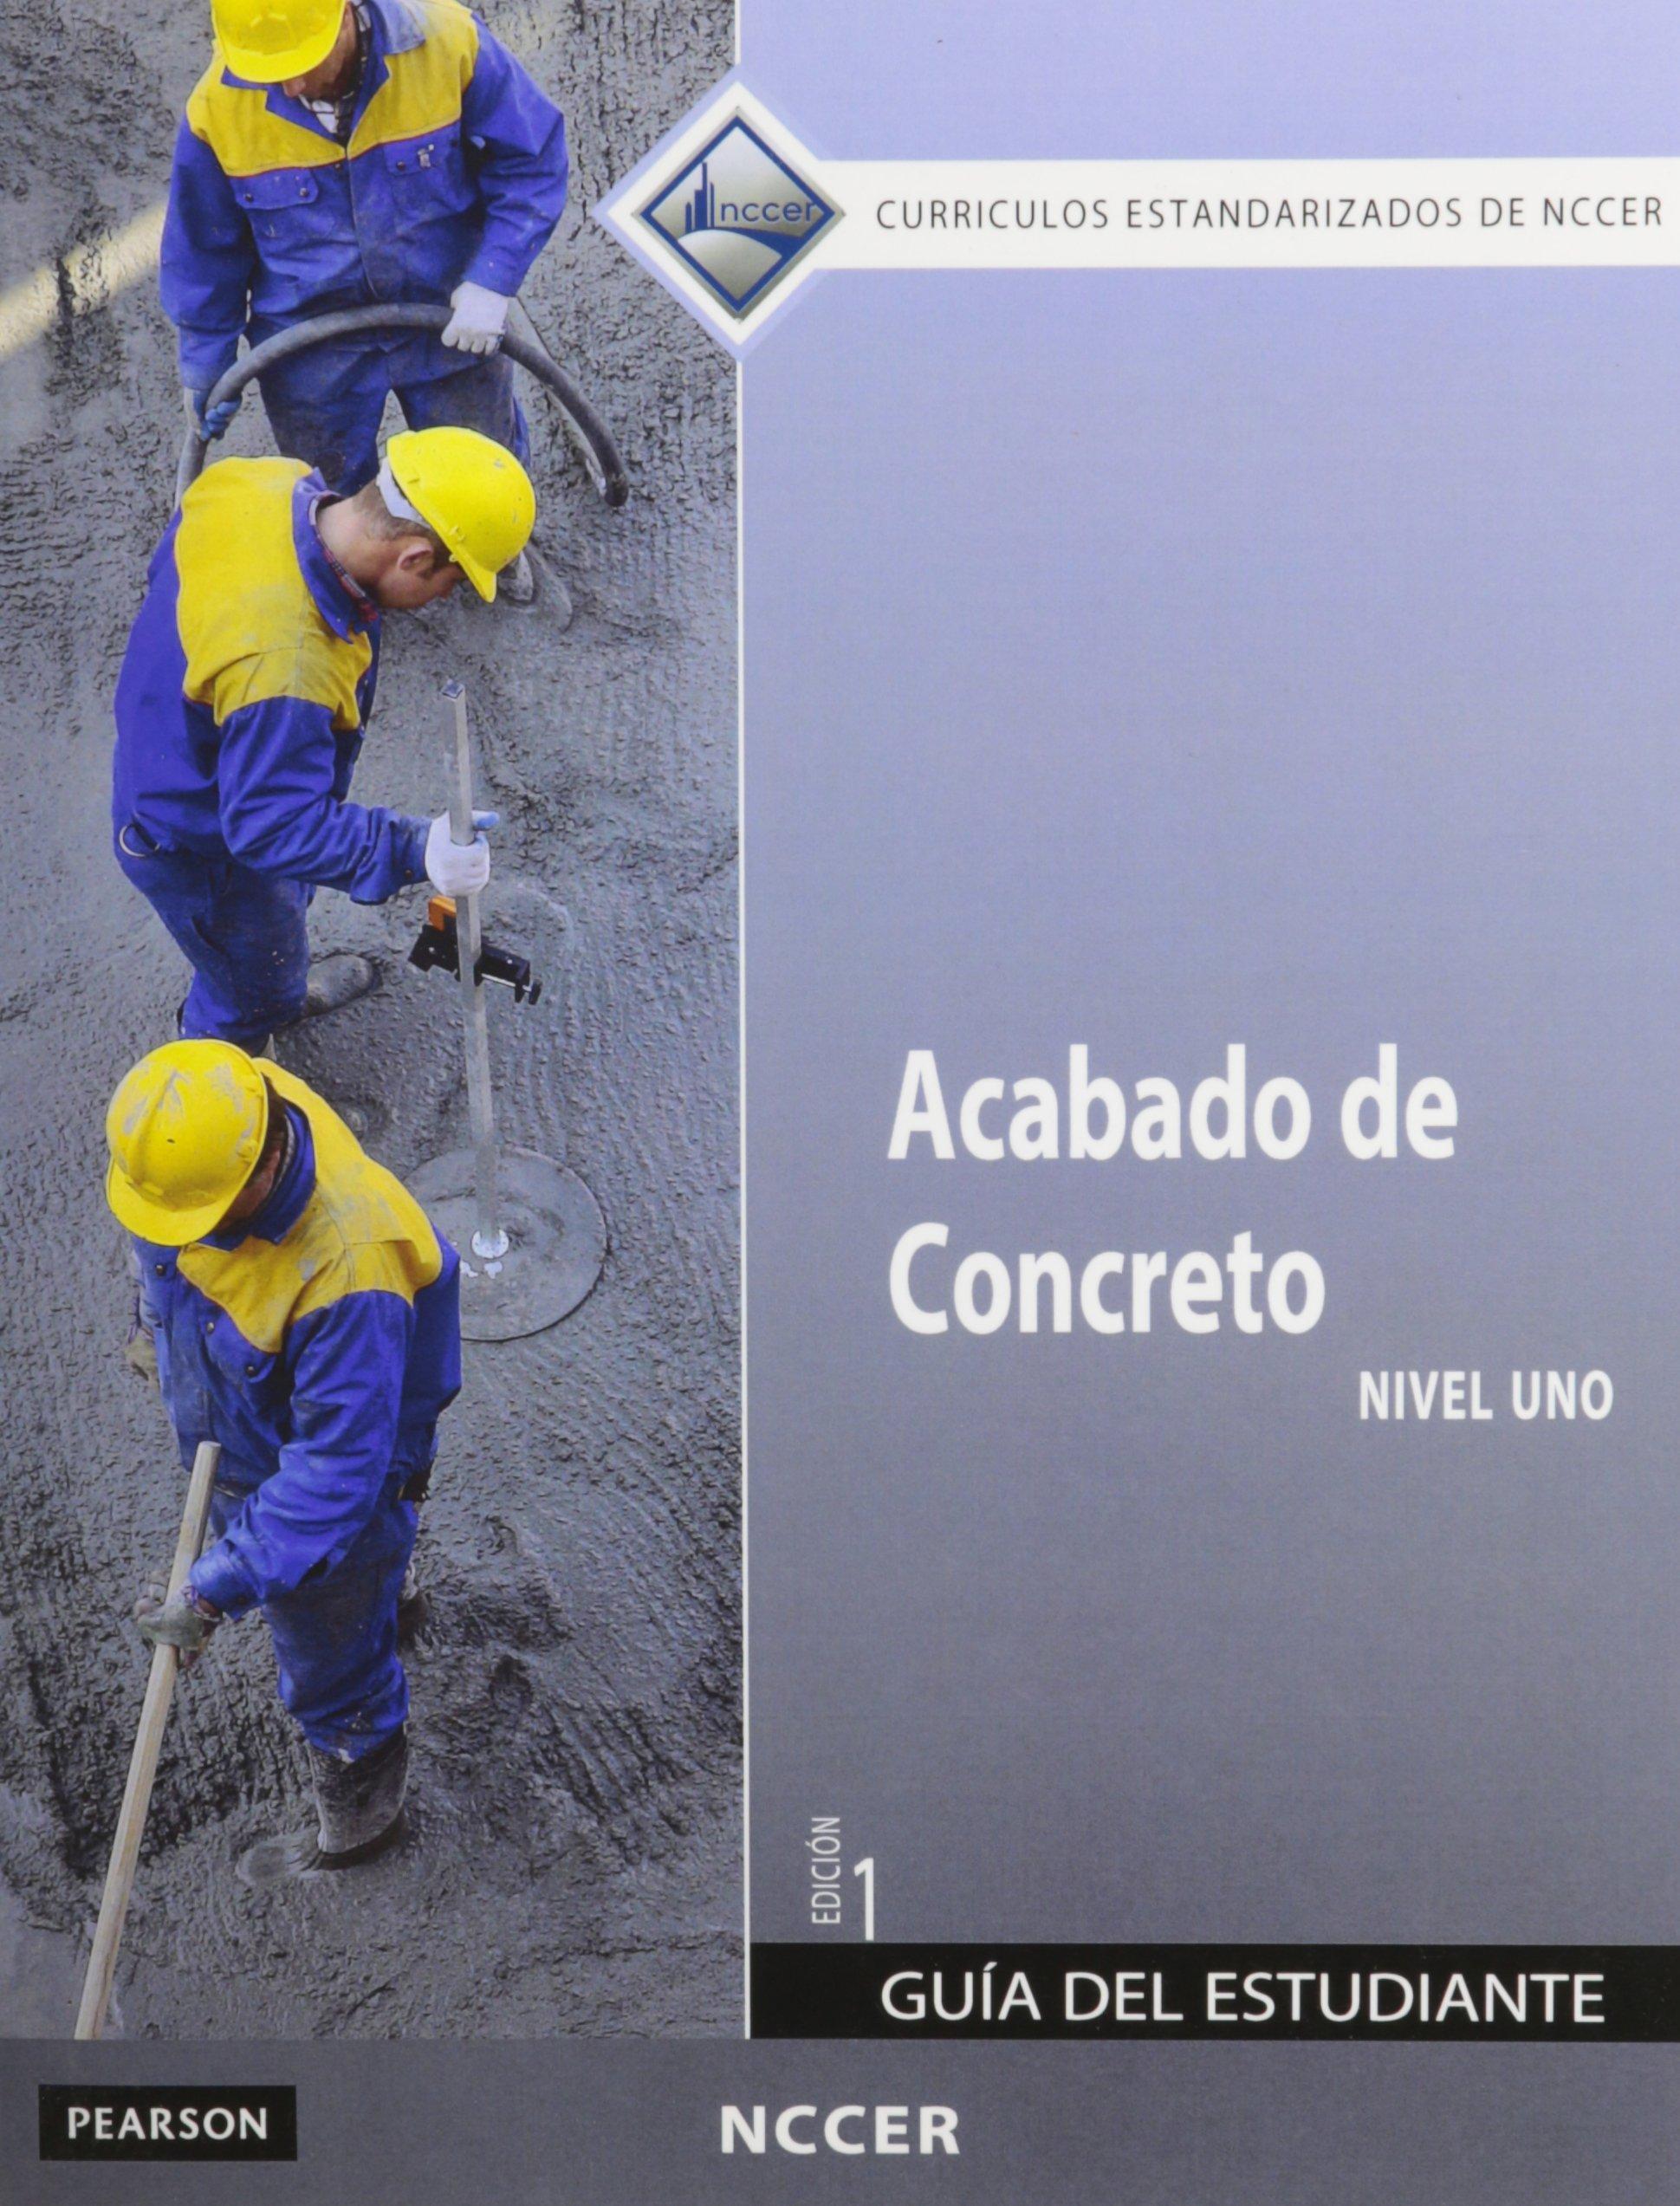 Concrete Finishing Level 1 Trainee Guide in Spanish (International  Version): Amazon.co.uk: NCCER: 9780133752595: Books